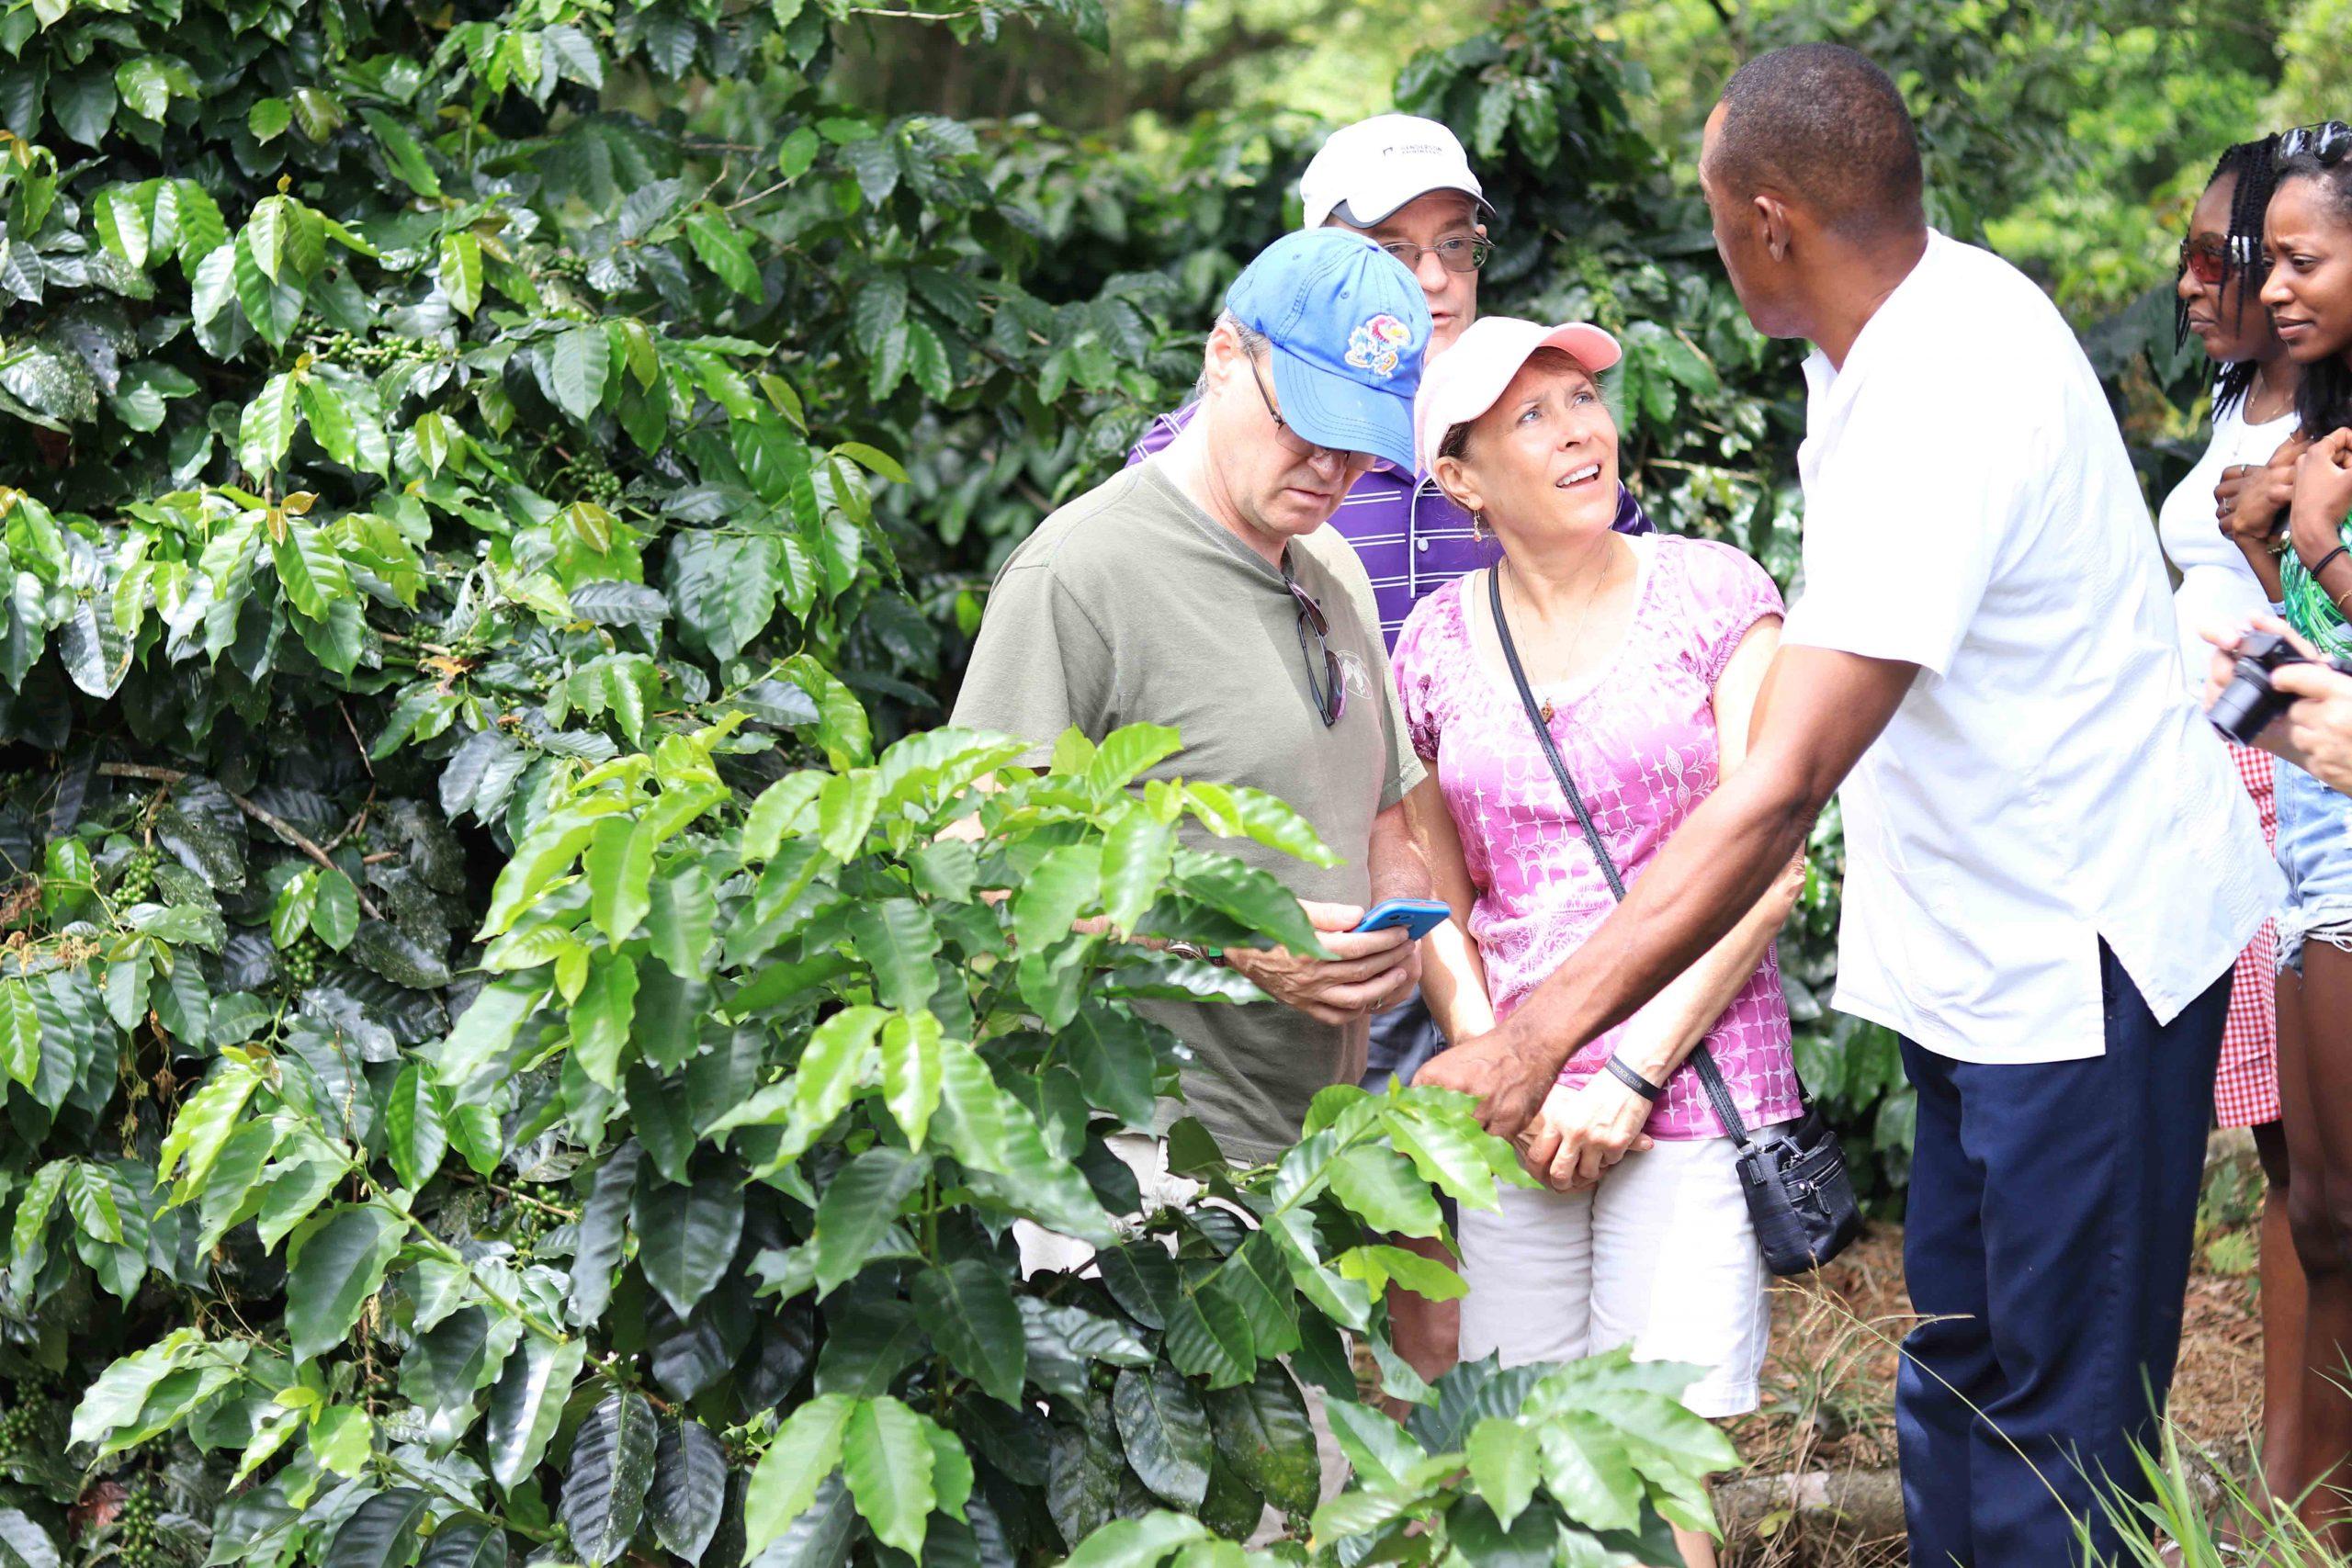 https://i0.wp.com/www.tasteofjamaicatours.com/wp-content/uploads/2020/04/Taste-of-Jamaica-Farm-Tour-42.00-scaled.jpg?fit=2560%2C1707